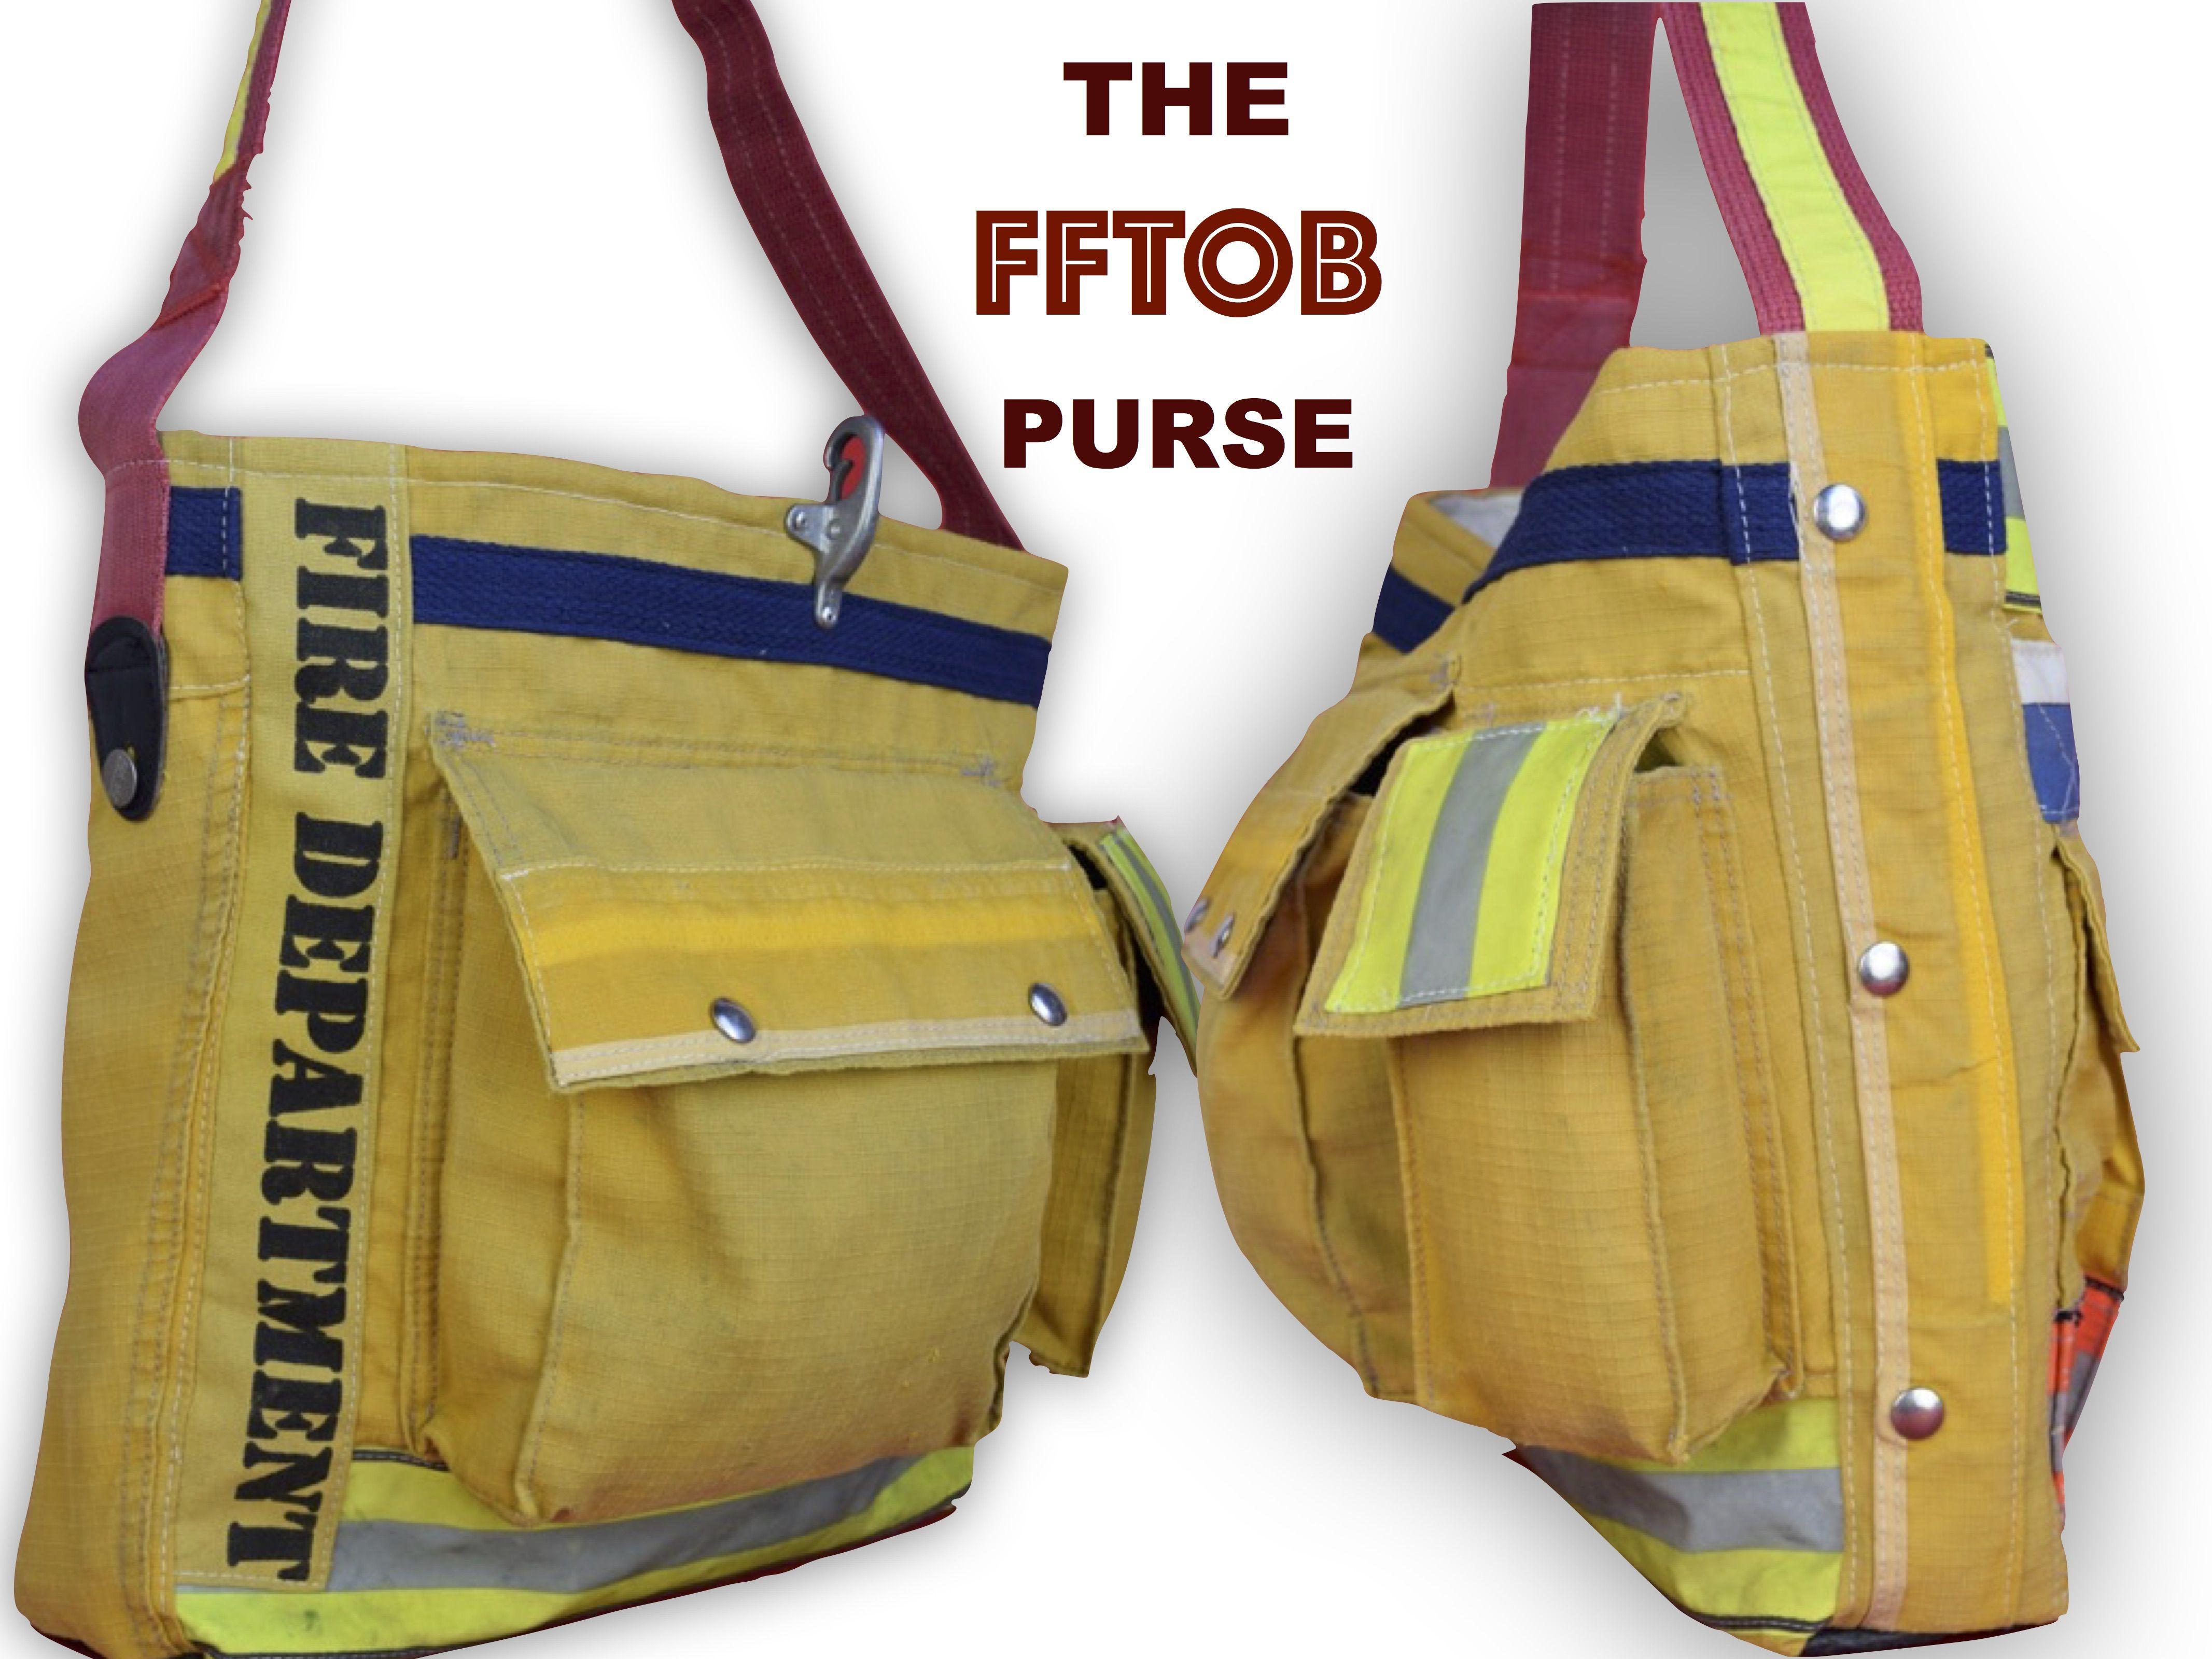 Original Firefighter Turnout Bag By Niki Rasor Since 2008 Uses 99 Retired Donated Bunker Gear